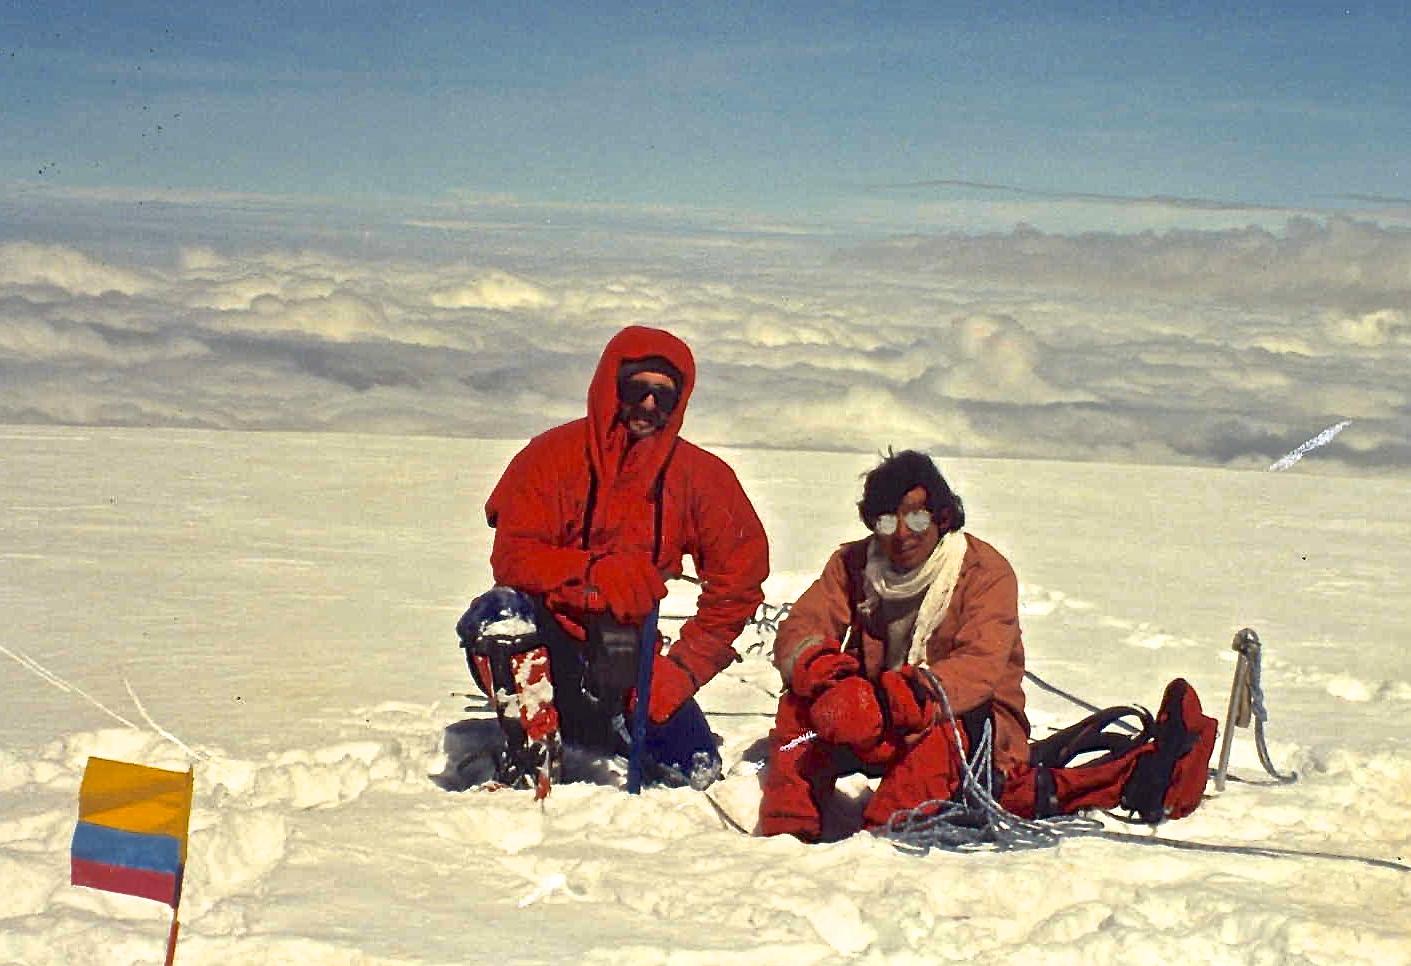 On the summit of Chimborazo with Ecuadorian guide Jorge Anhalzer.